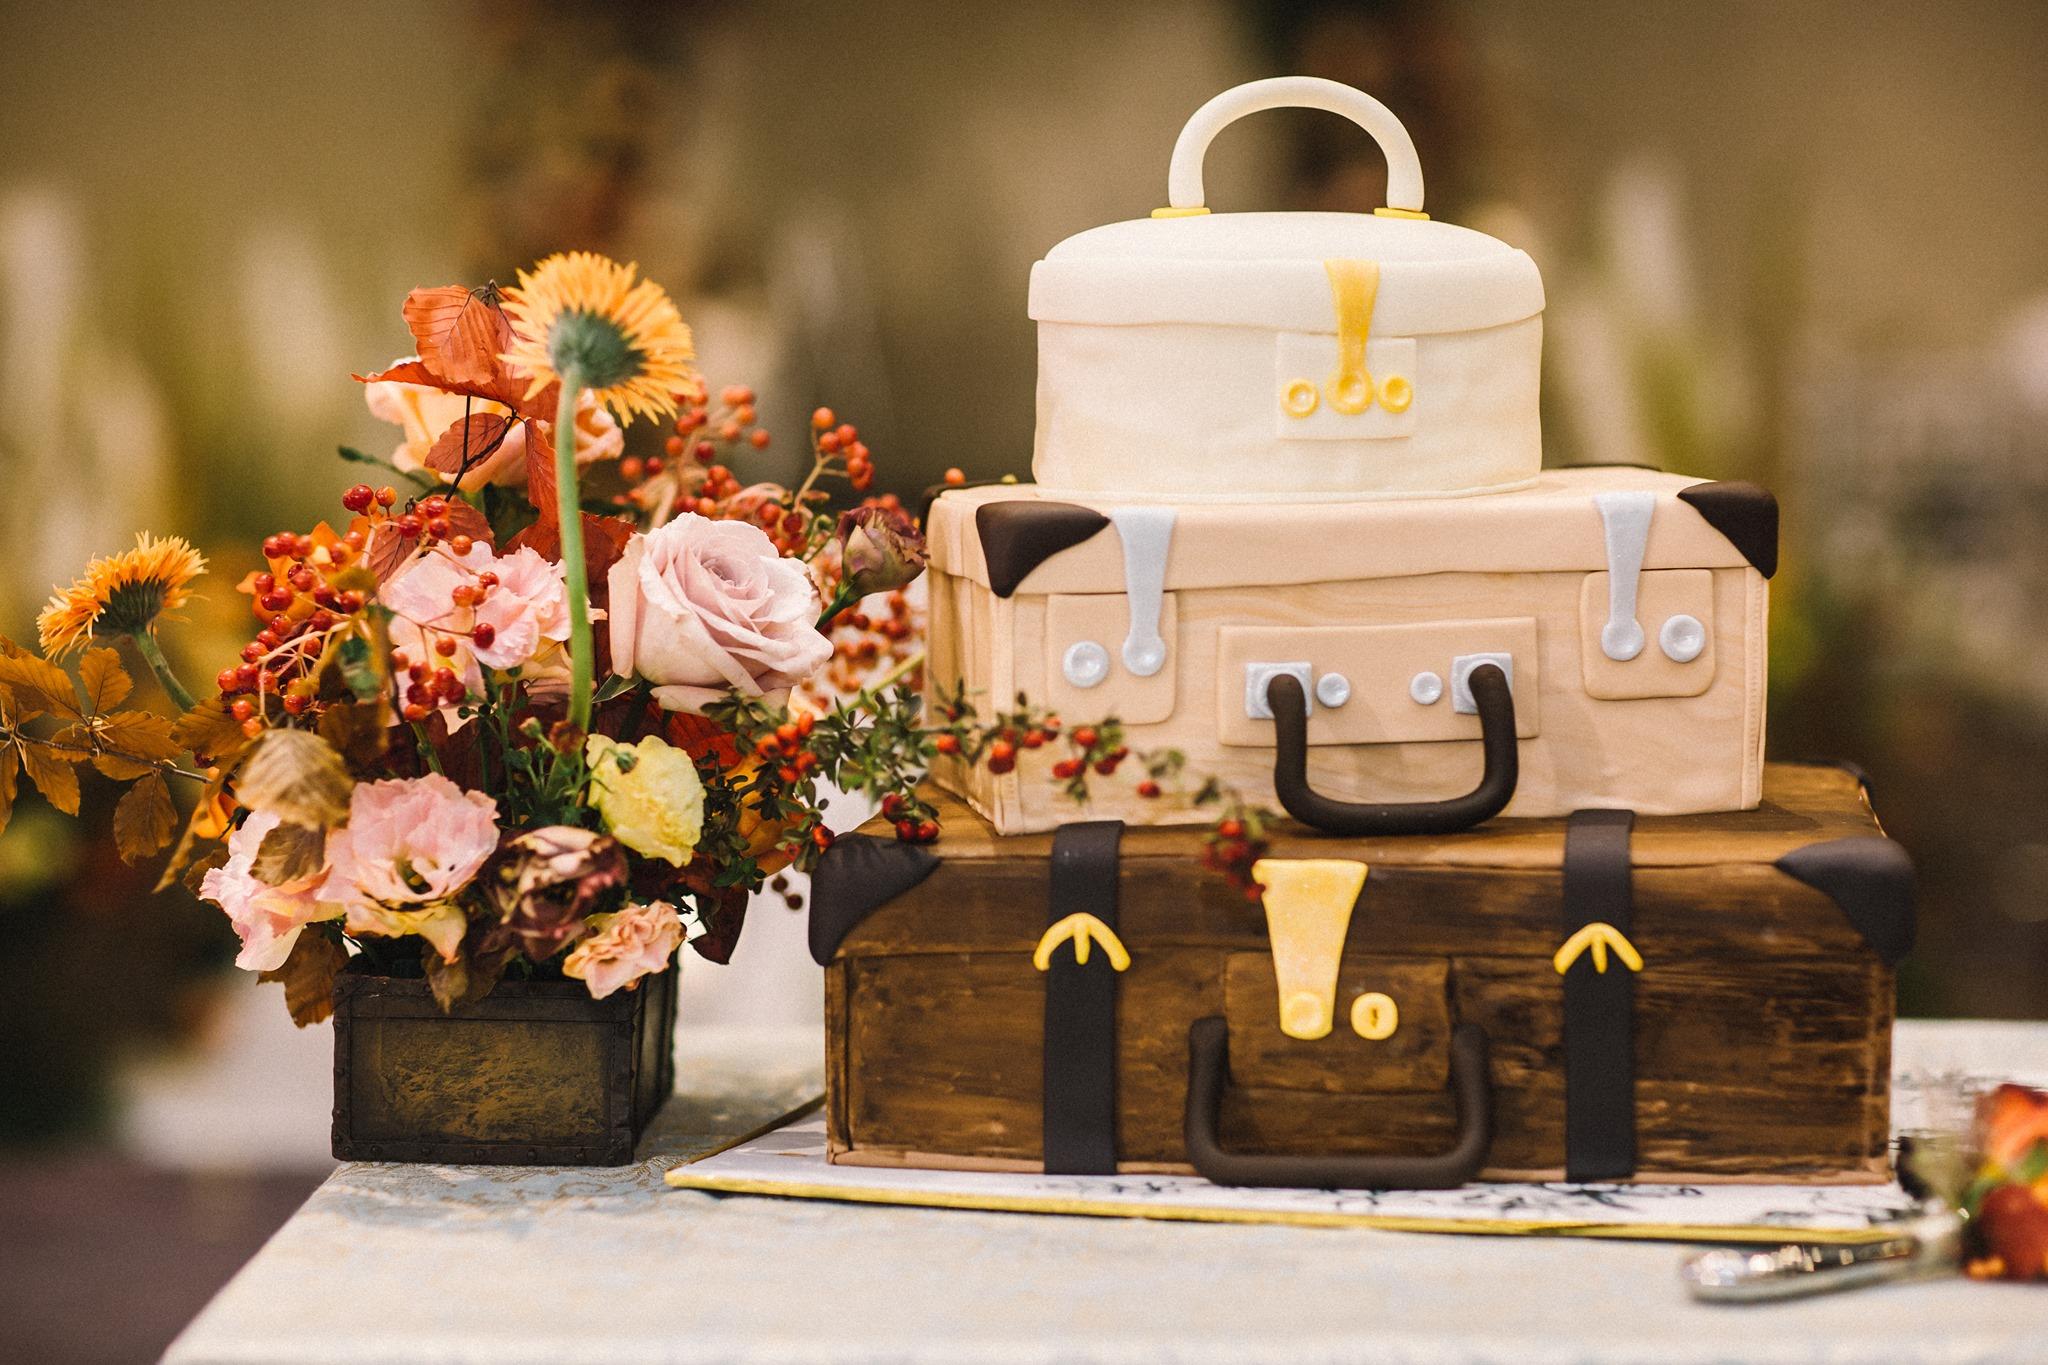 creative wedding cake at 5 star hotel in hanoi